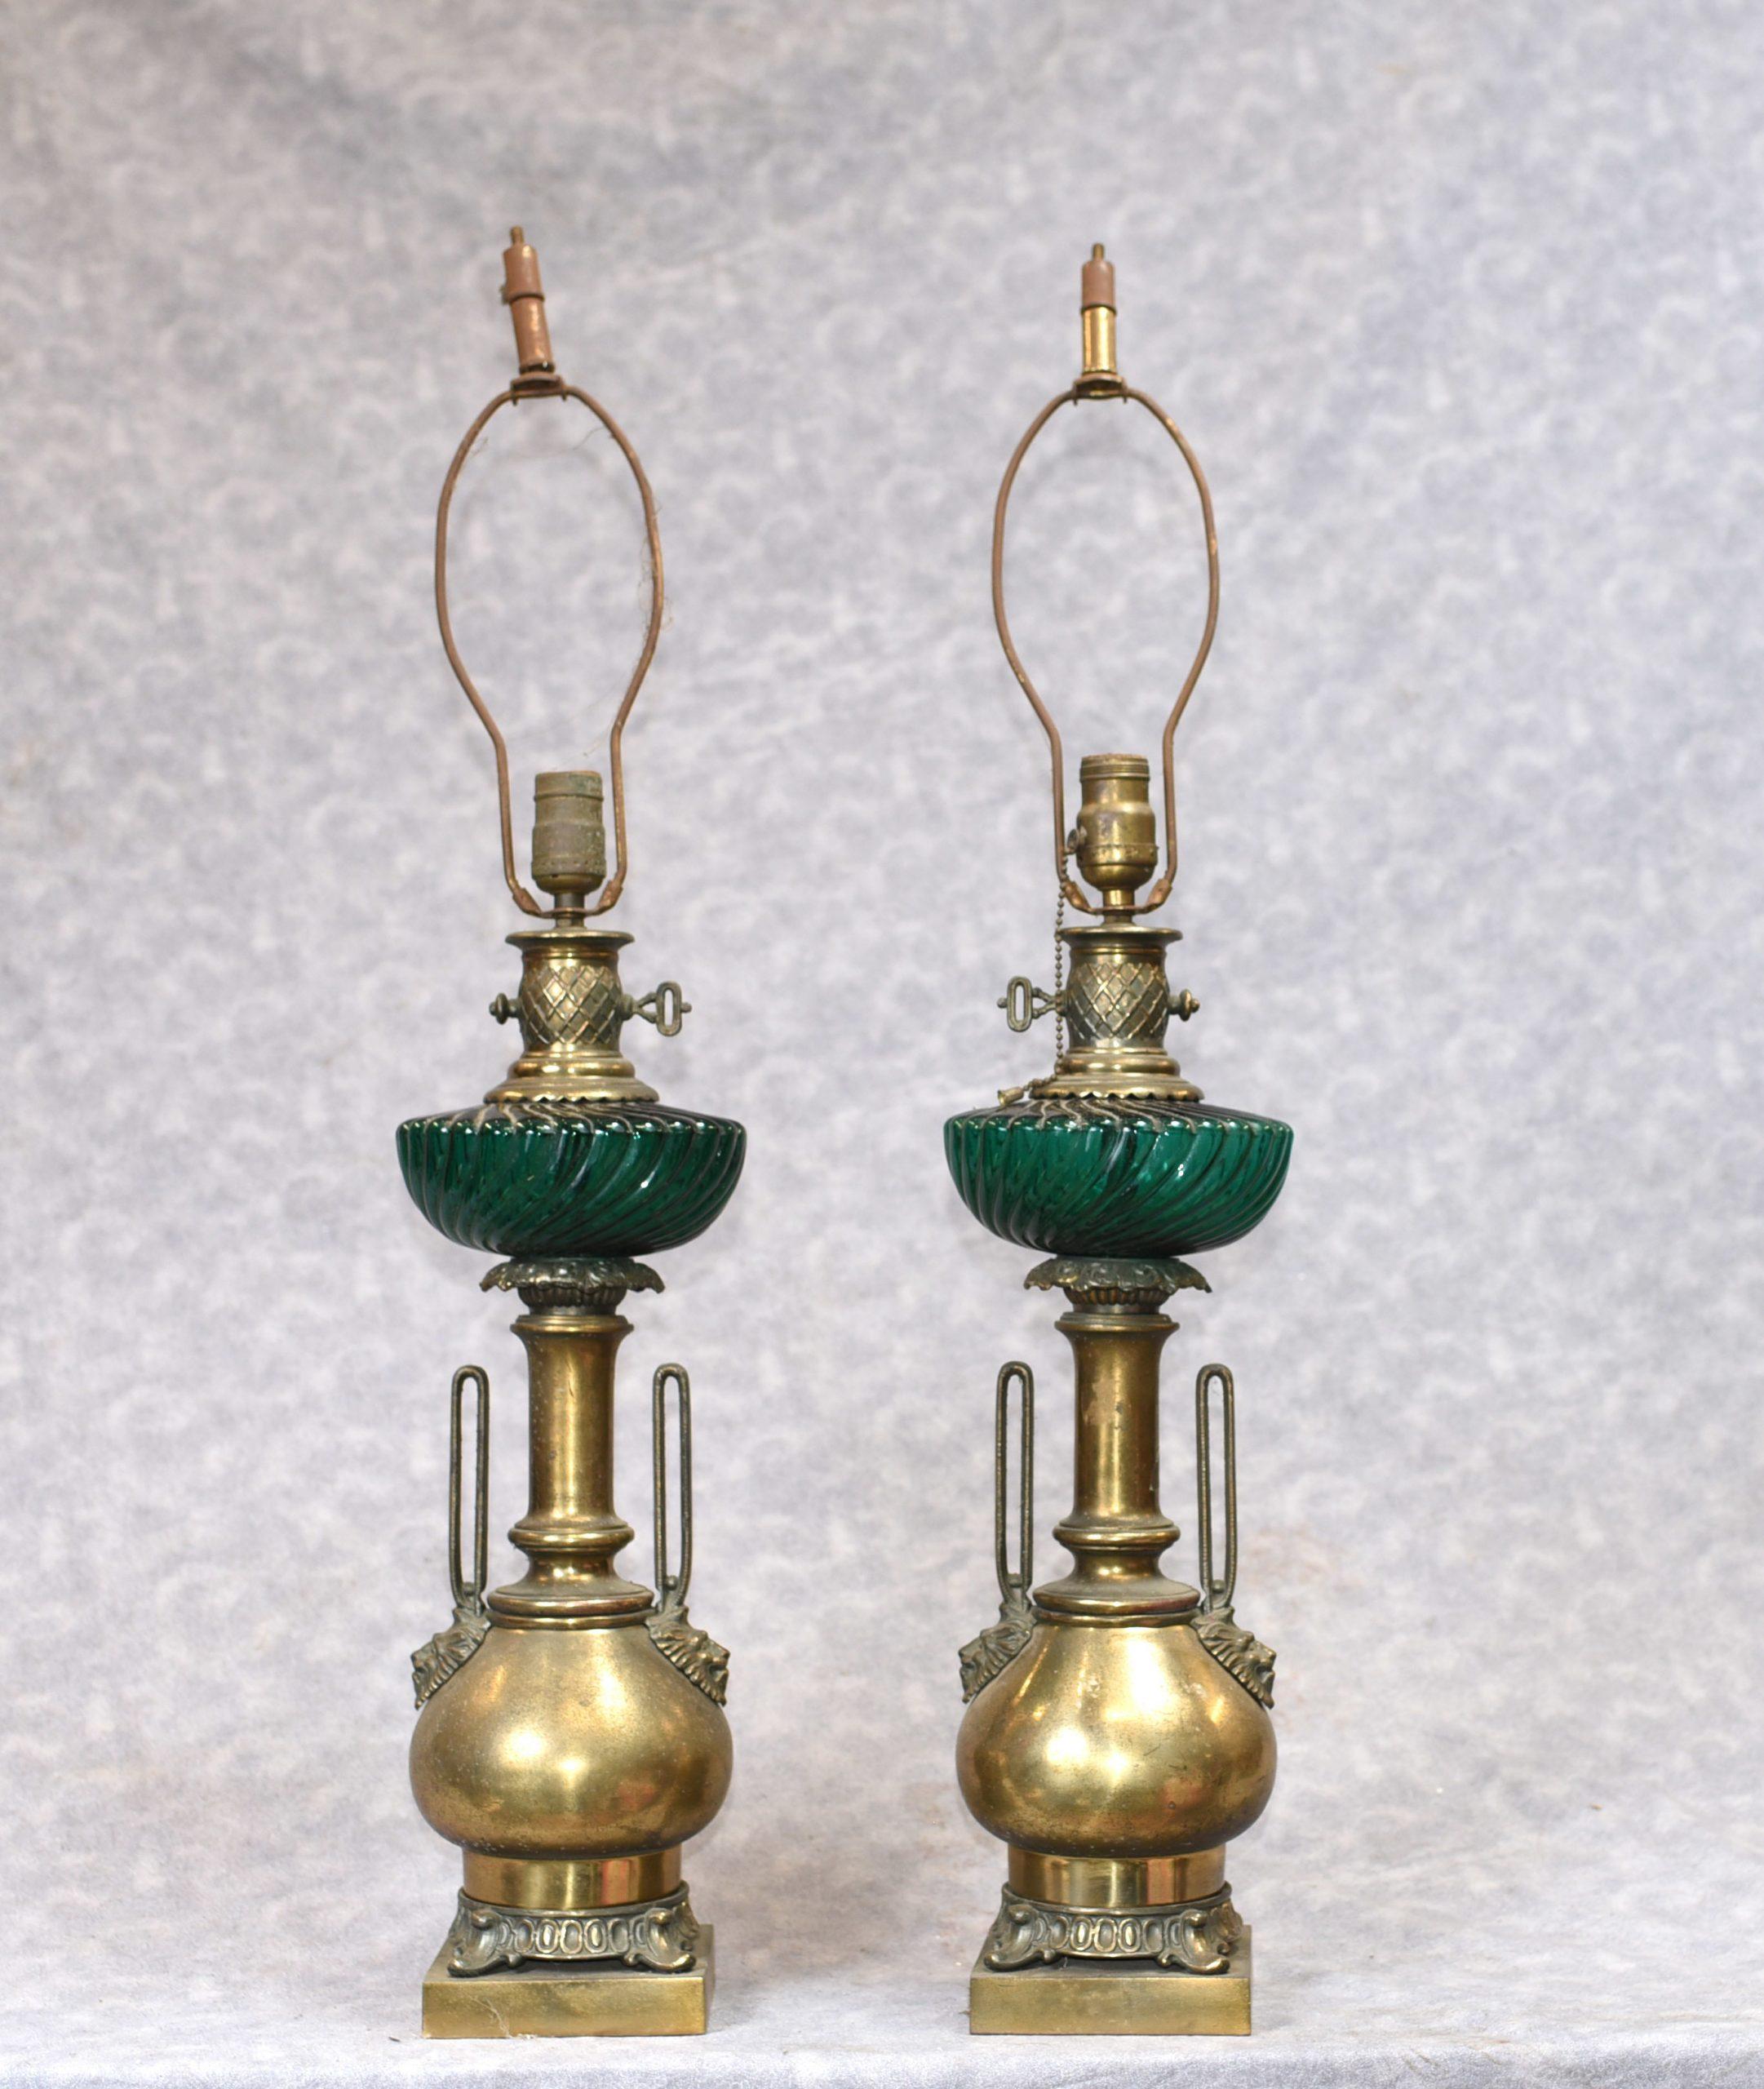 lamps victorian antique brass accessories